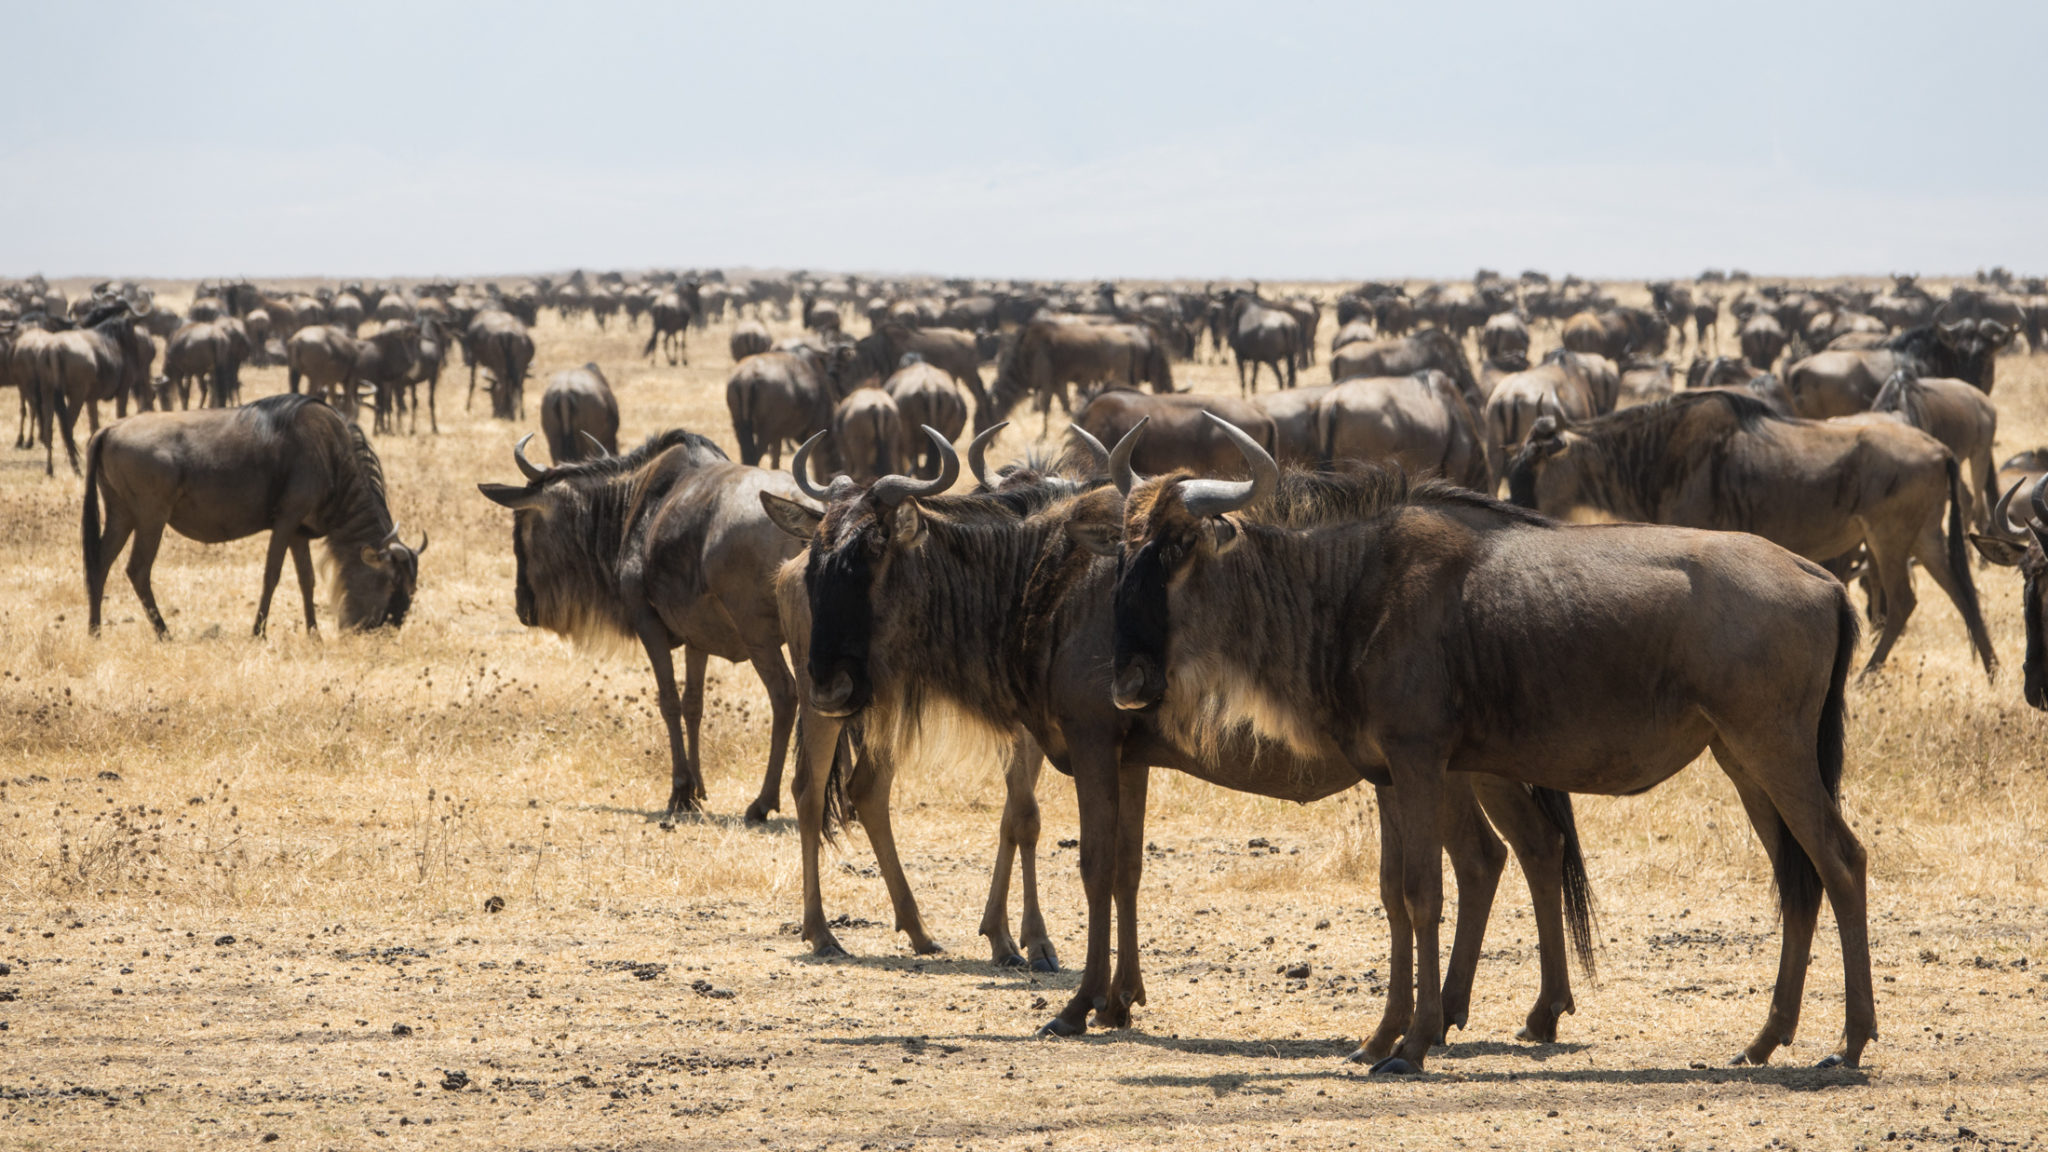 Gnuherde im Ngorongoro Krater, Tansania